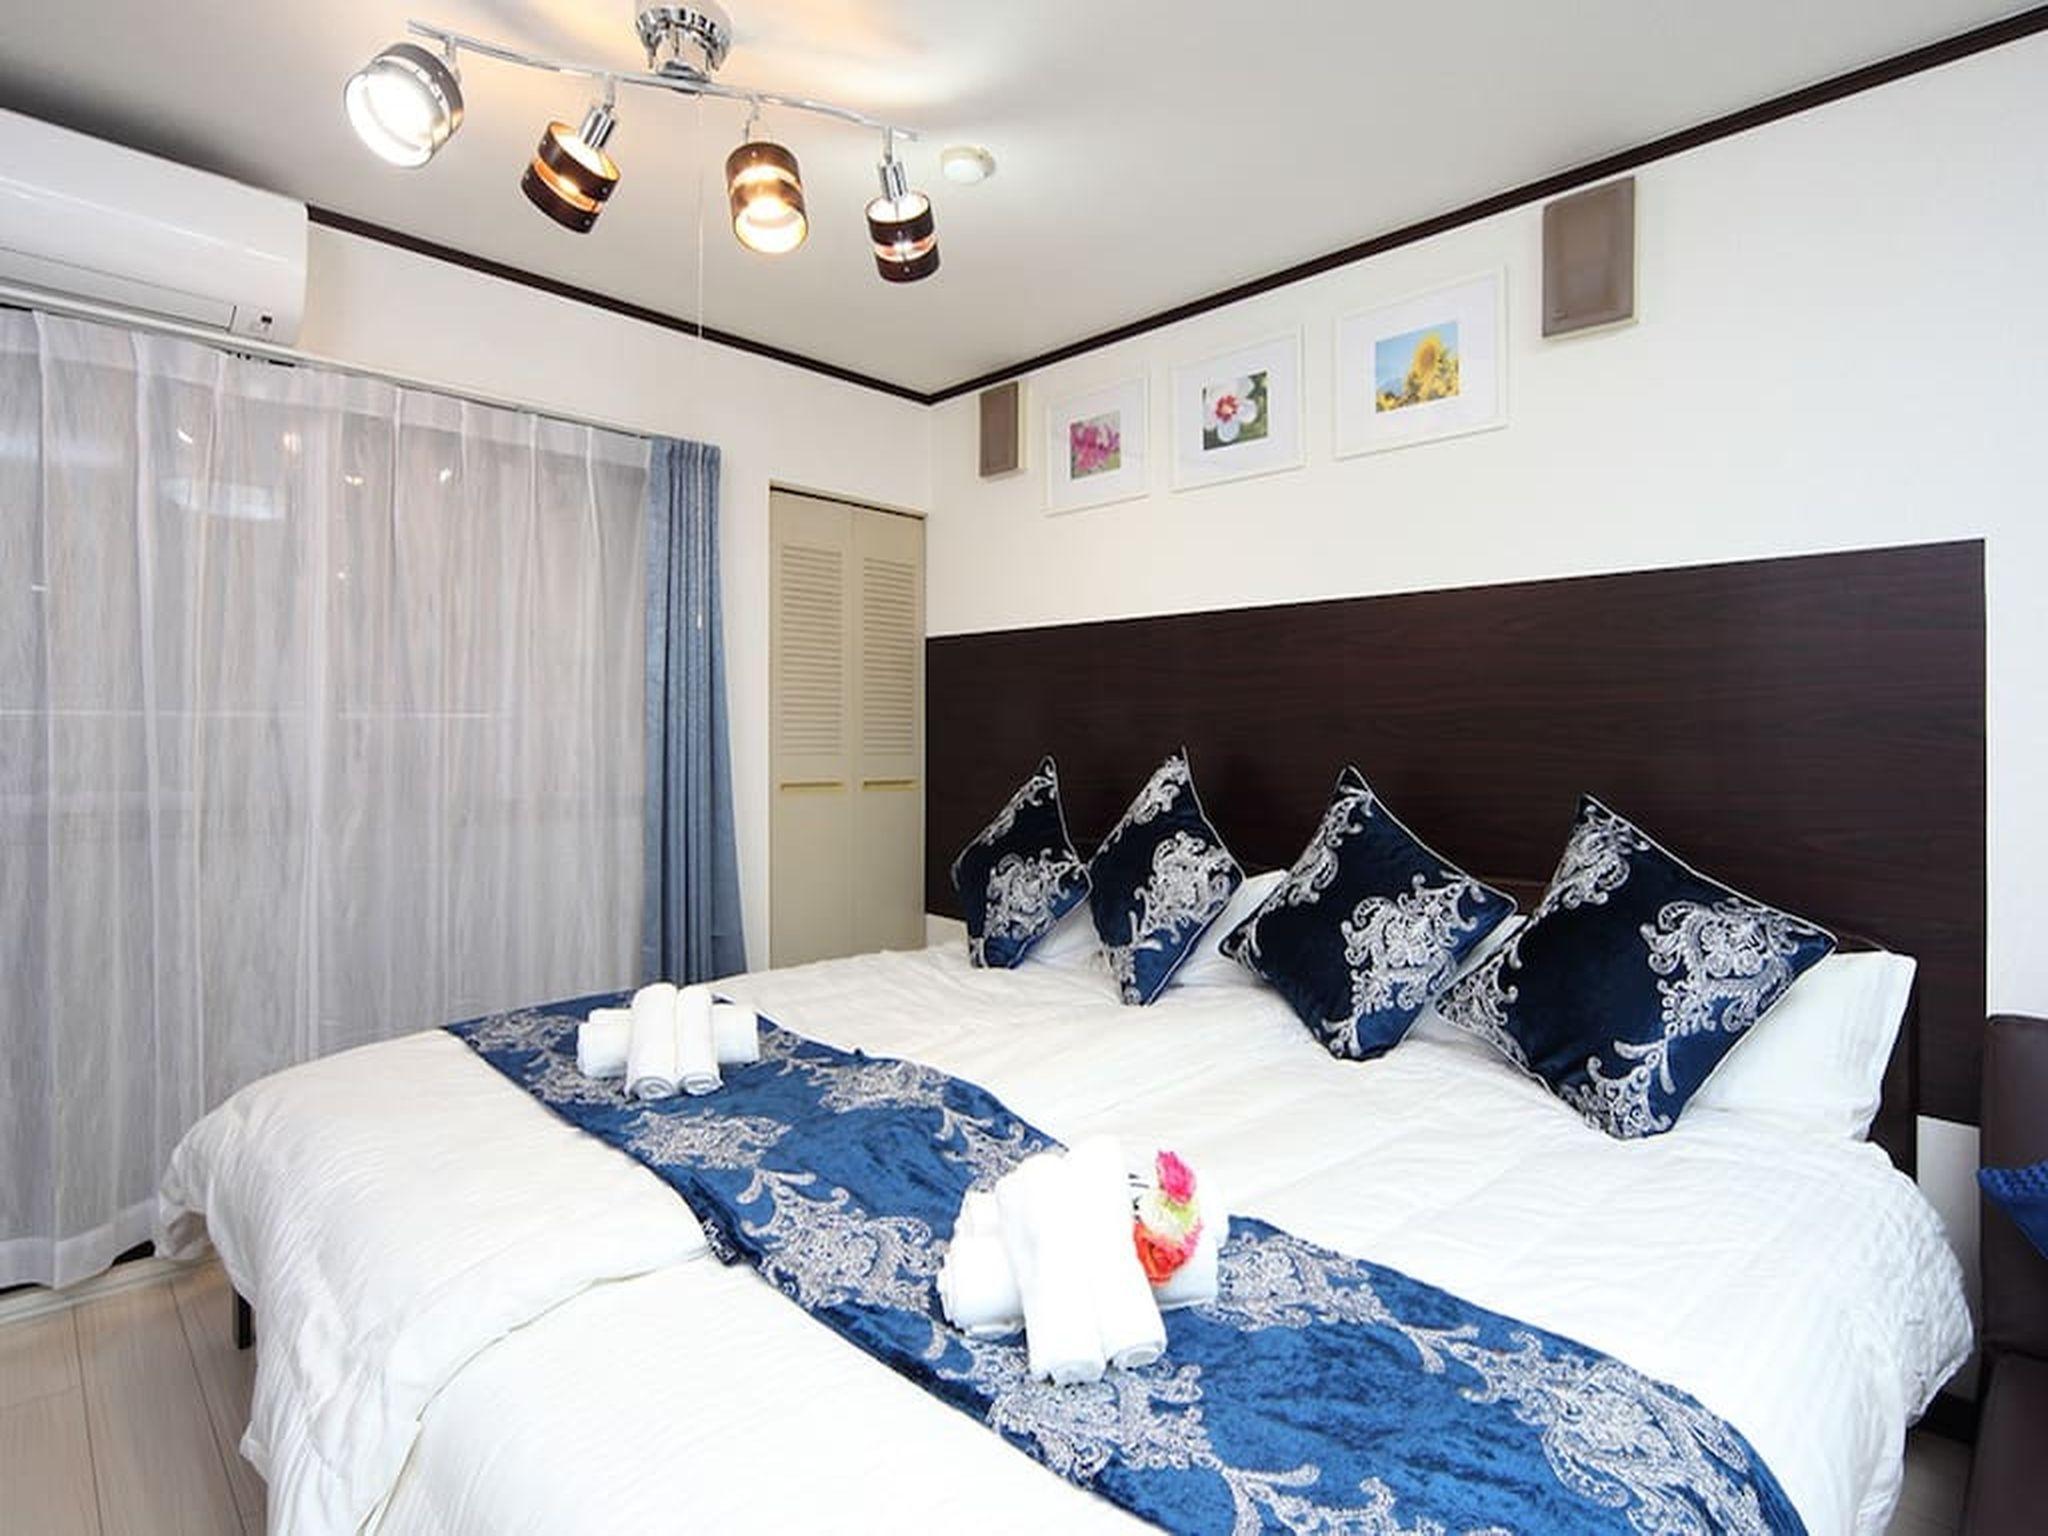 Kj 1 Bedroom Apt Near Osaka 102 Sun Plaza Osaka Japan